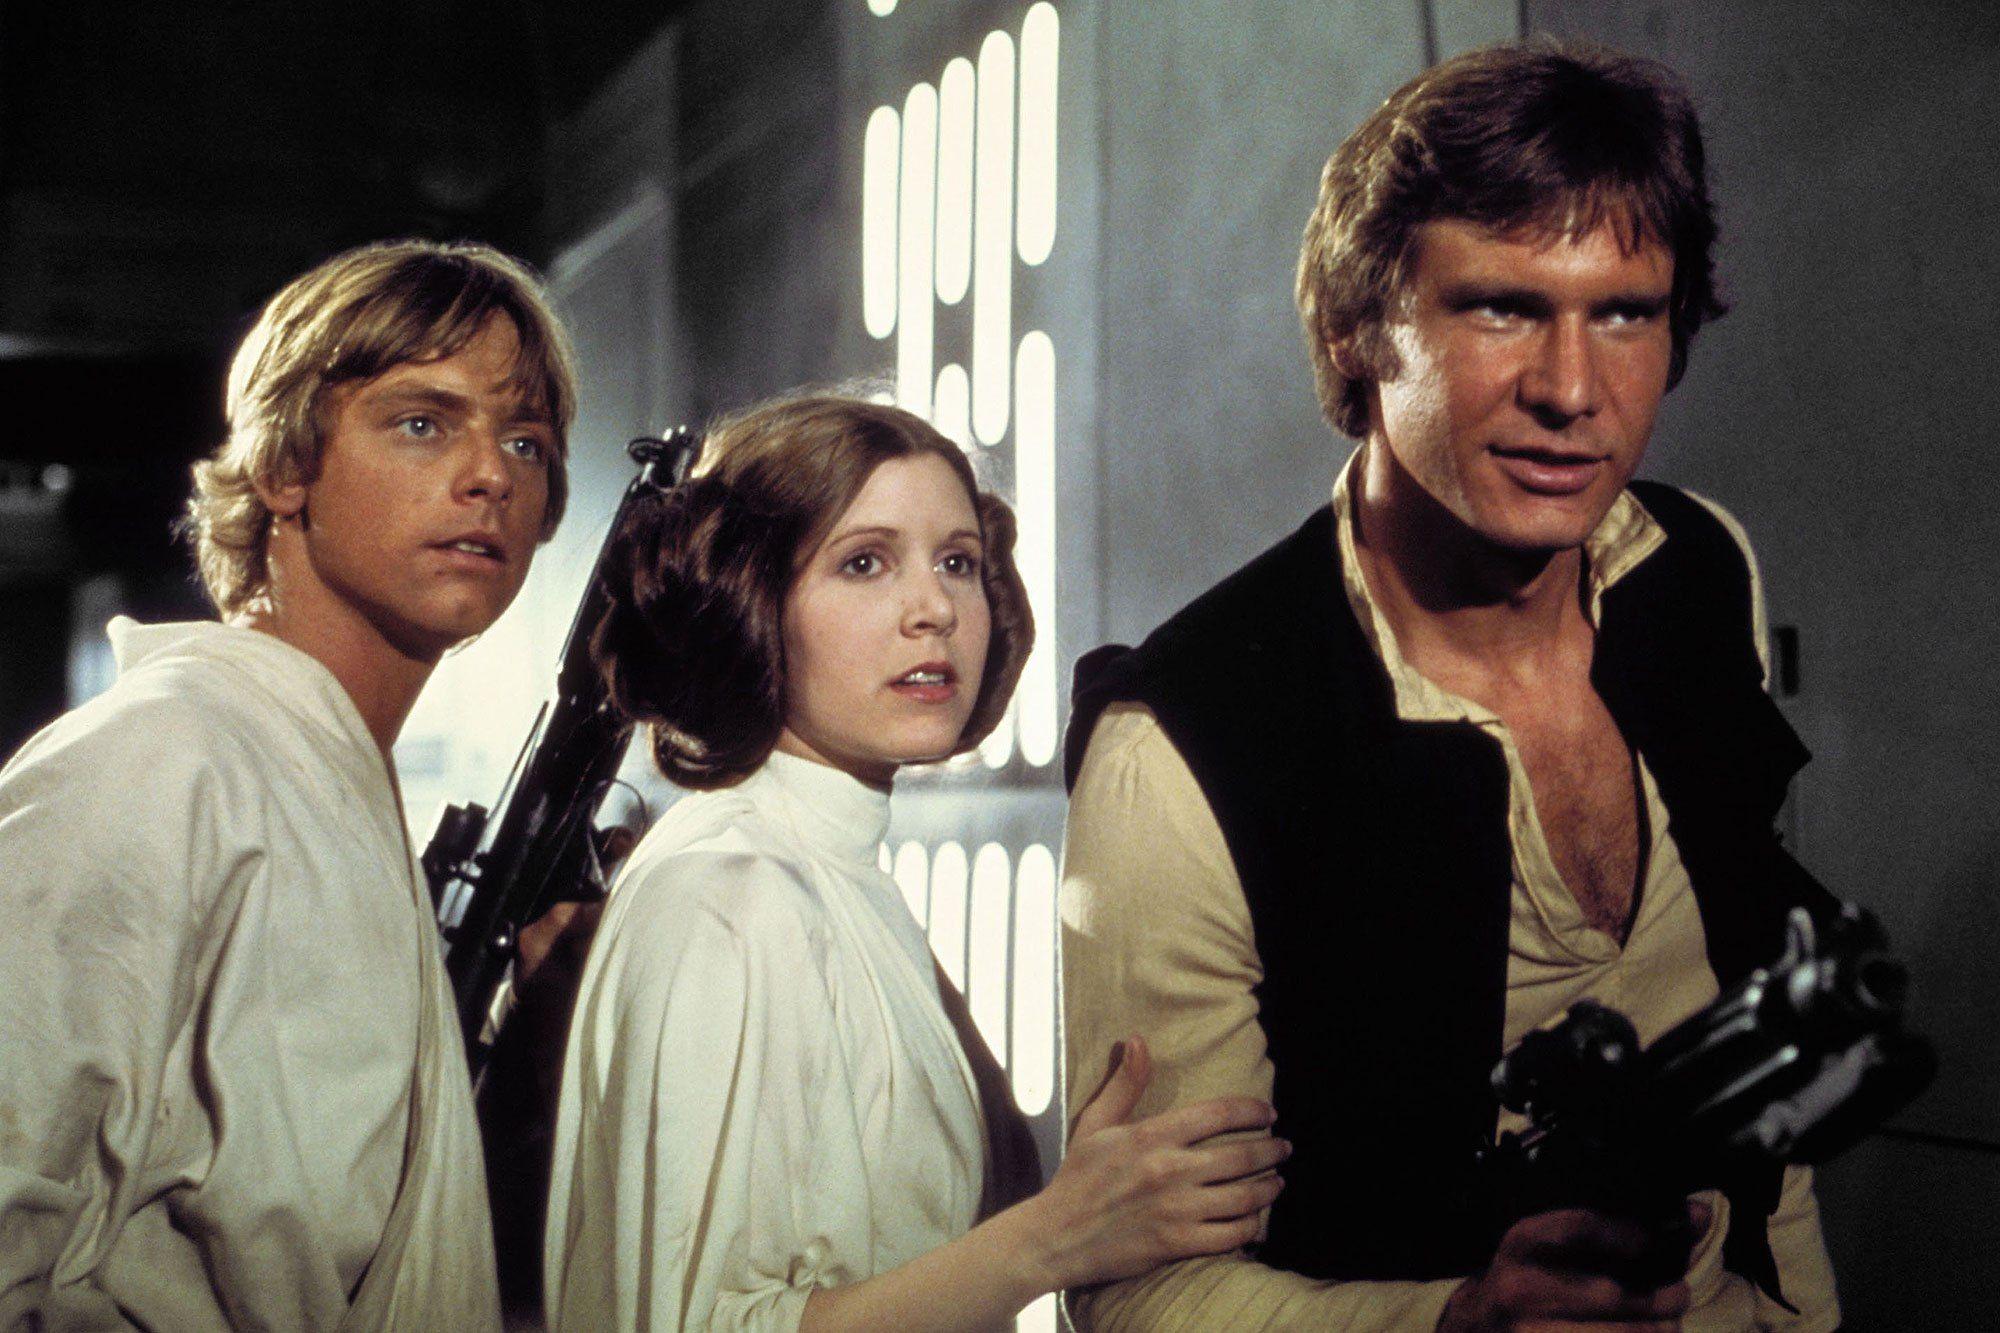 Carrie murió días después de sufrir un infarto